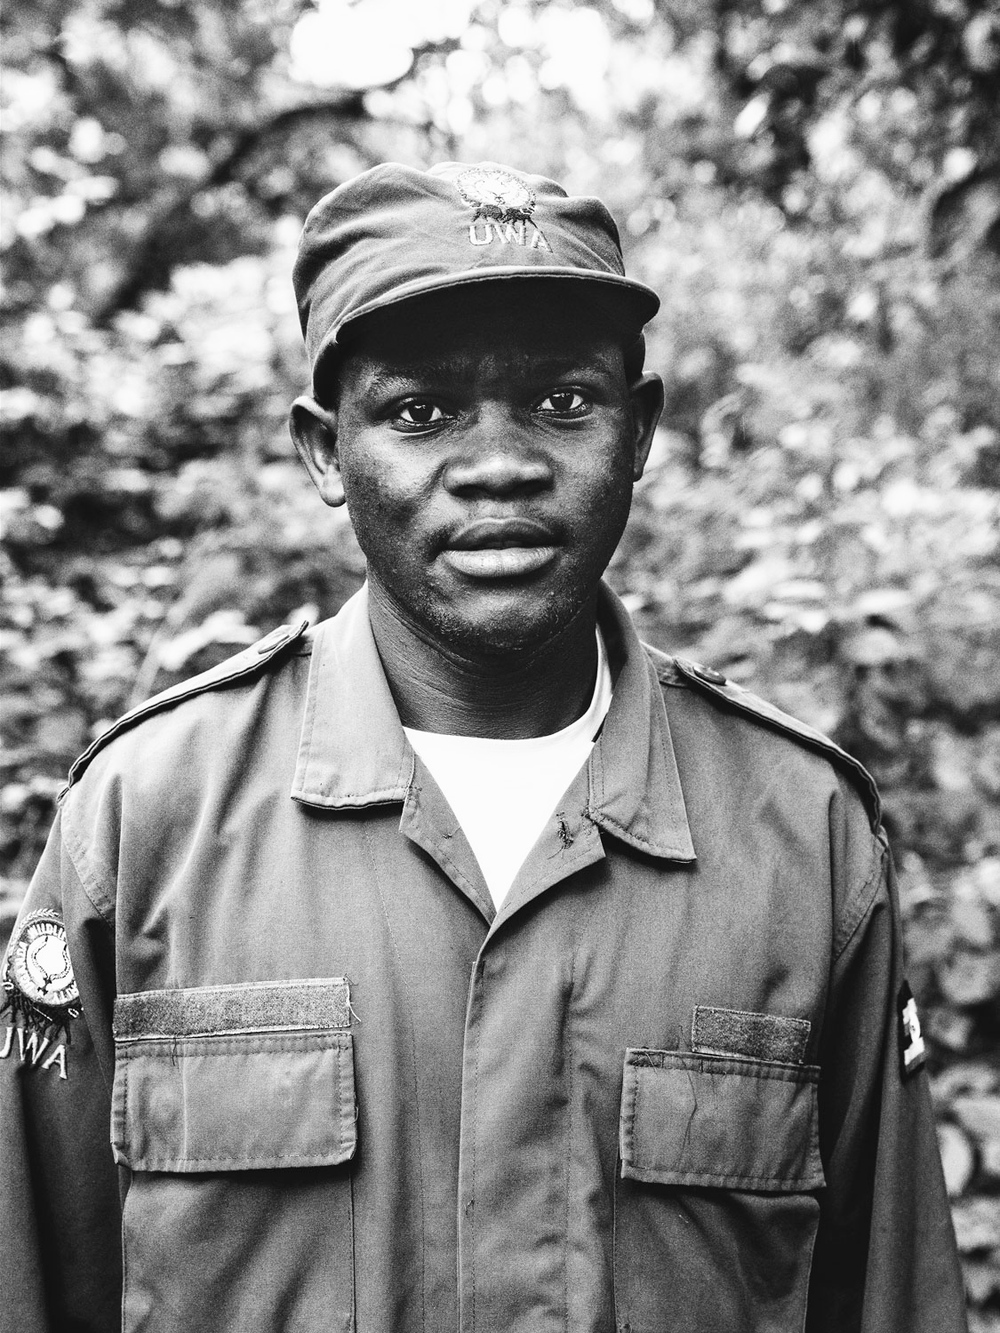 CallieGiovanna_Africa_Uganda_BwindiImpenetrableForest_20150101_09677.jpg